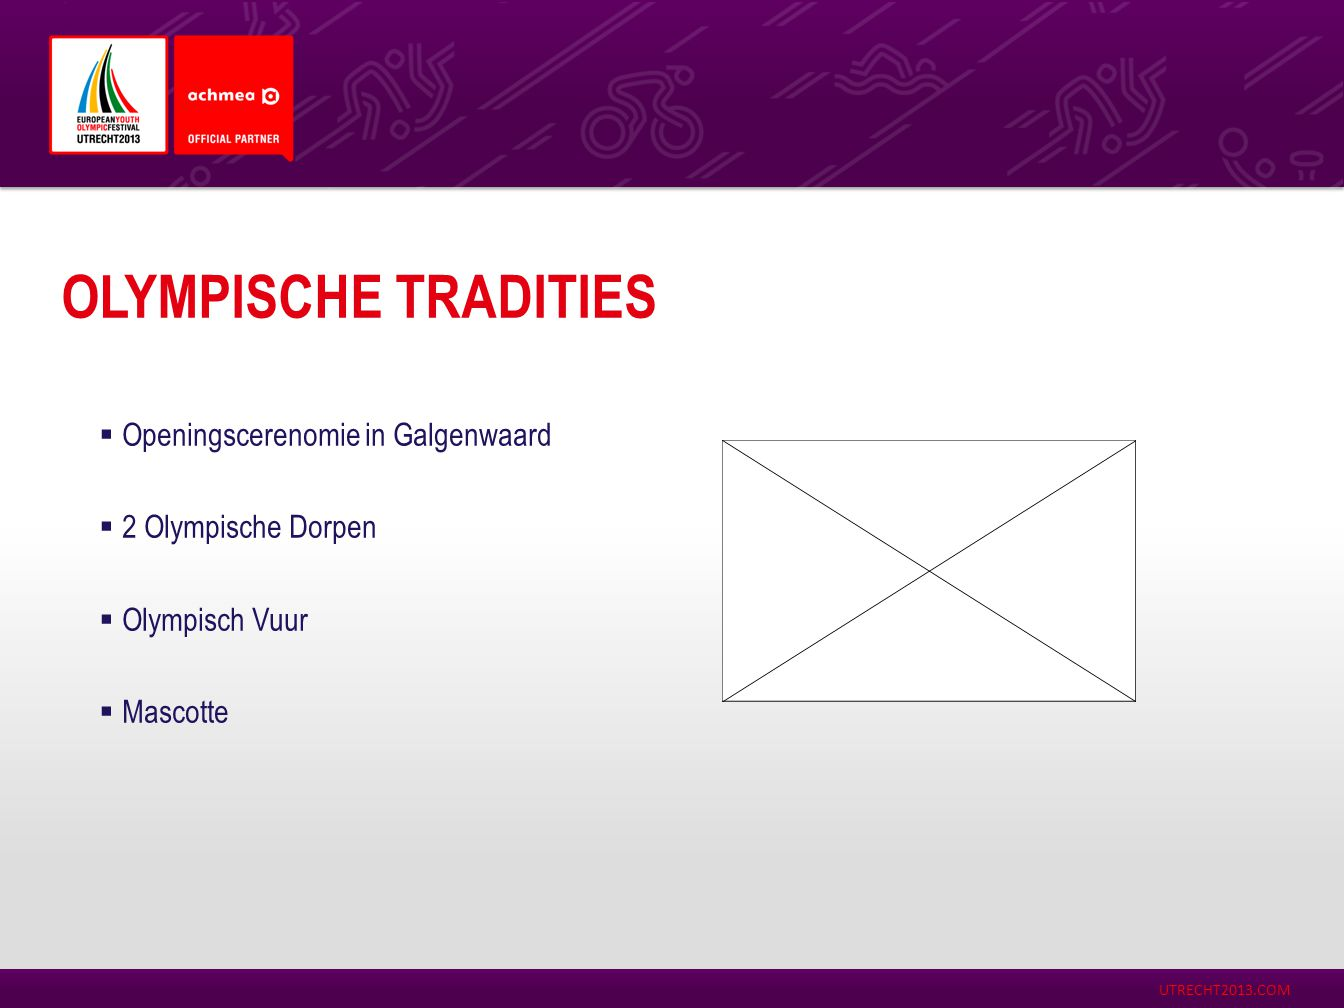 UTRECHT2013.COM ACHMEA HIGH FIVE CHALLENGE Programma:  Urban tour  Sportdagen  Fakkelestafette  Toppers op school